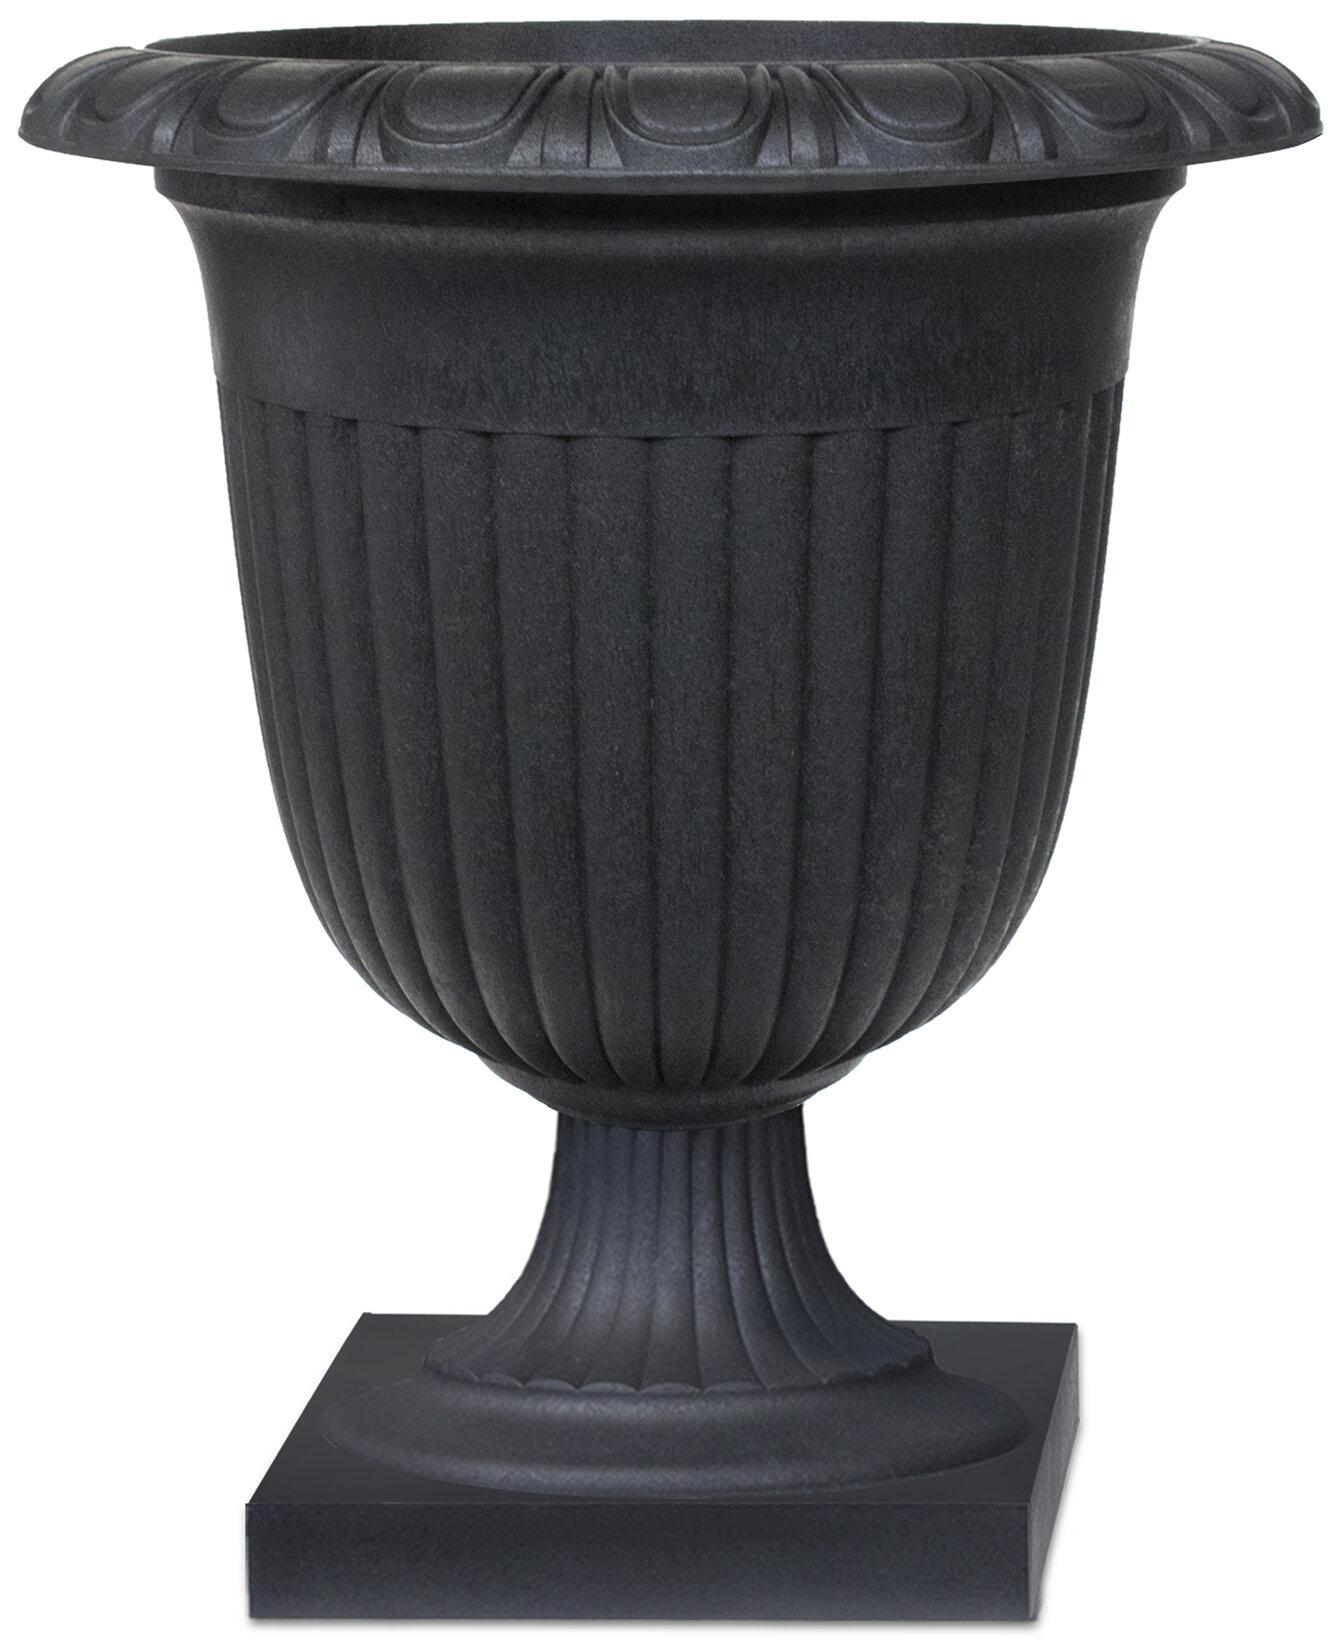 montgomerycaststoneurnplanterverde campania cast cfm international stone planter master product urn augusta hayneedle